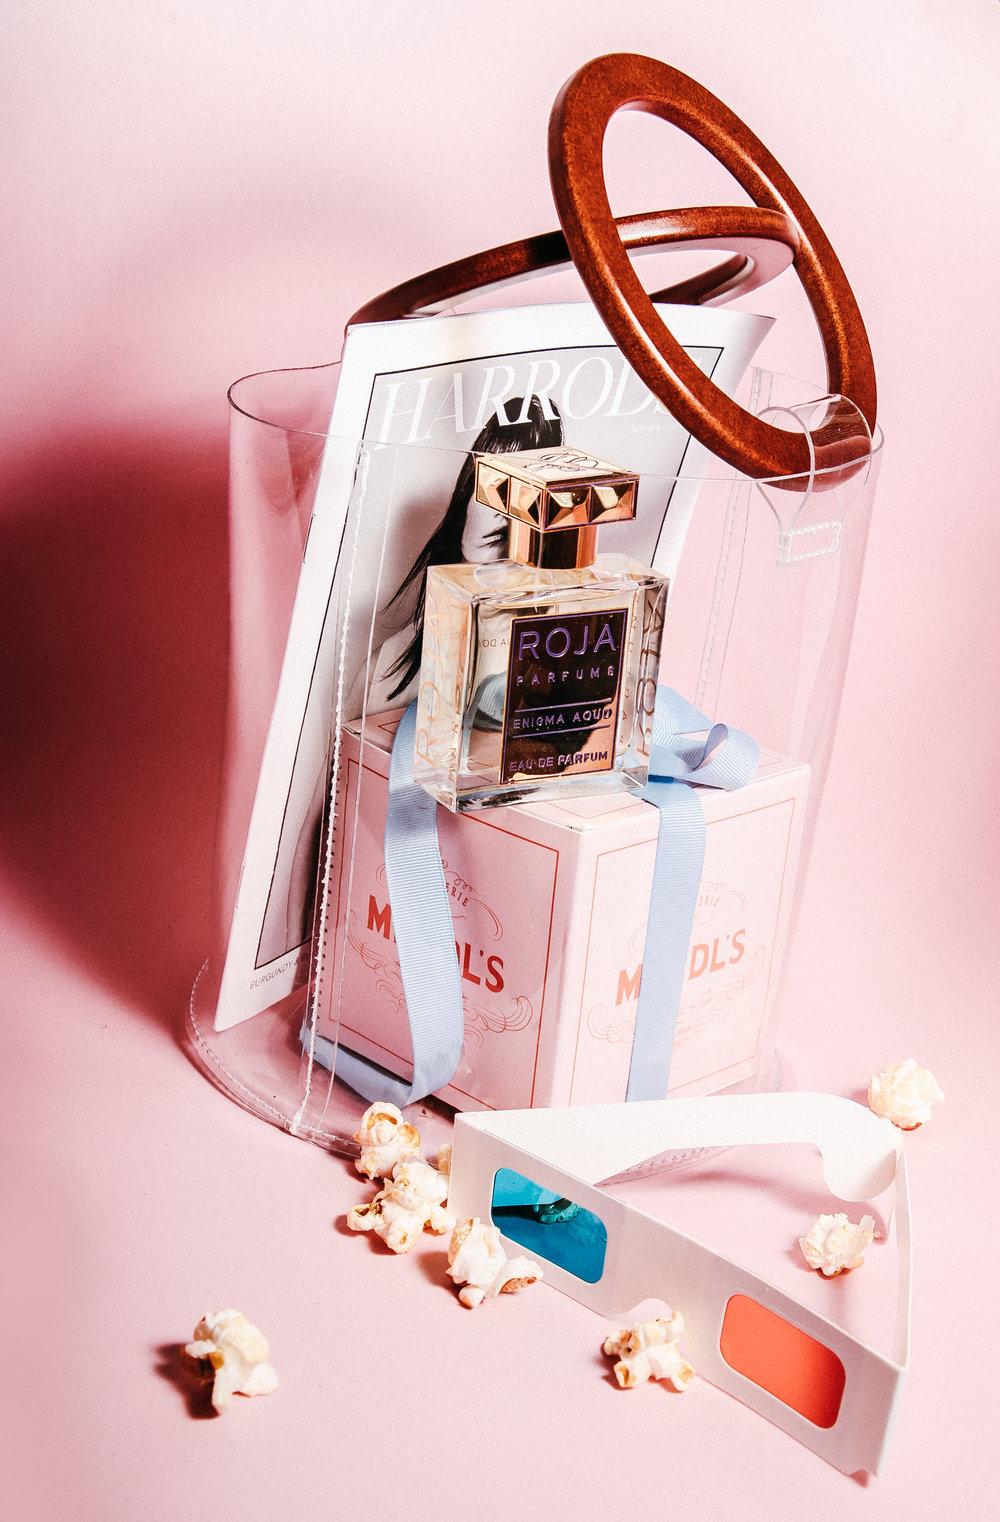 Roja parfums Enigma Aoud 50ml 5.jpg